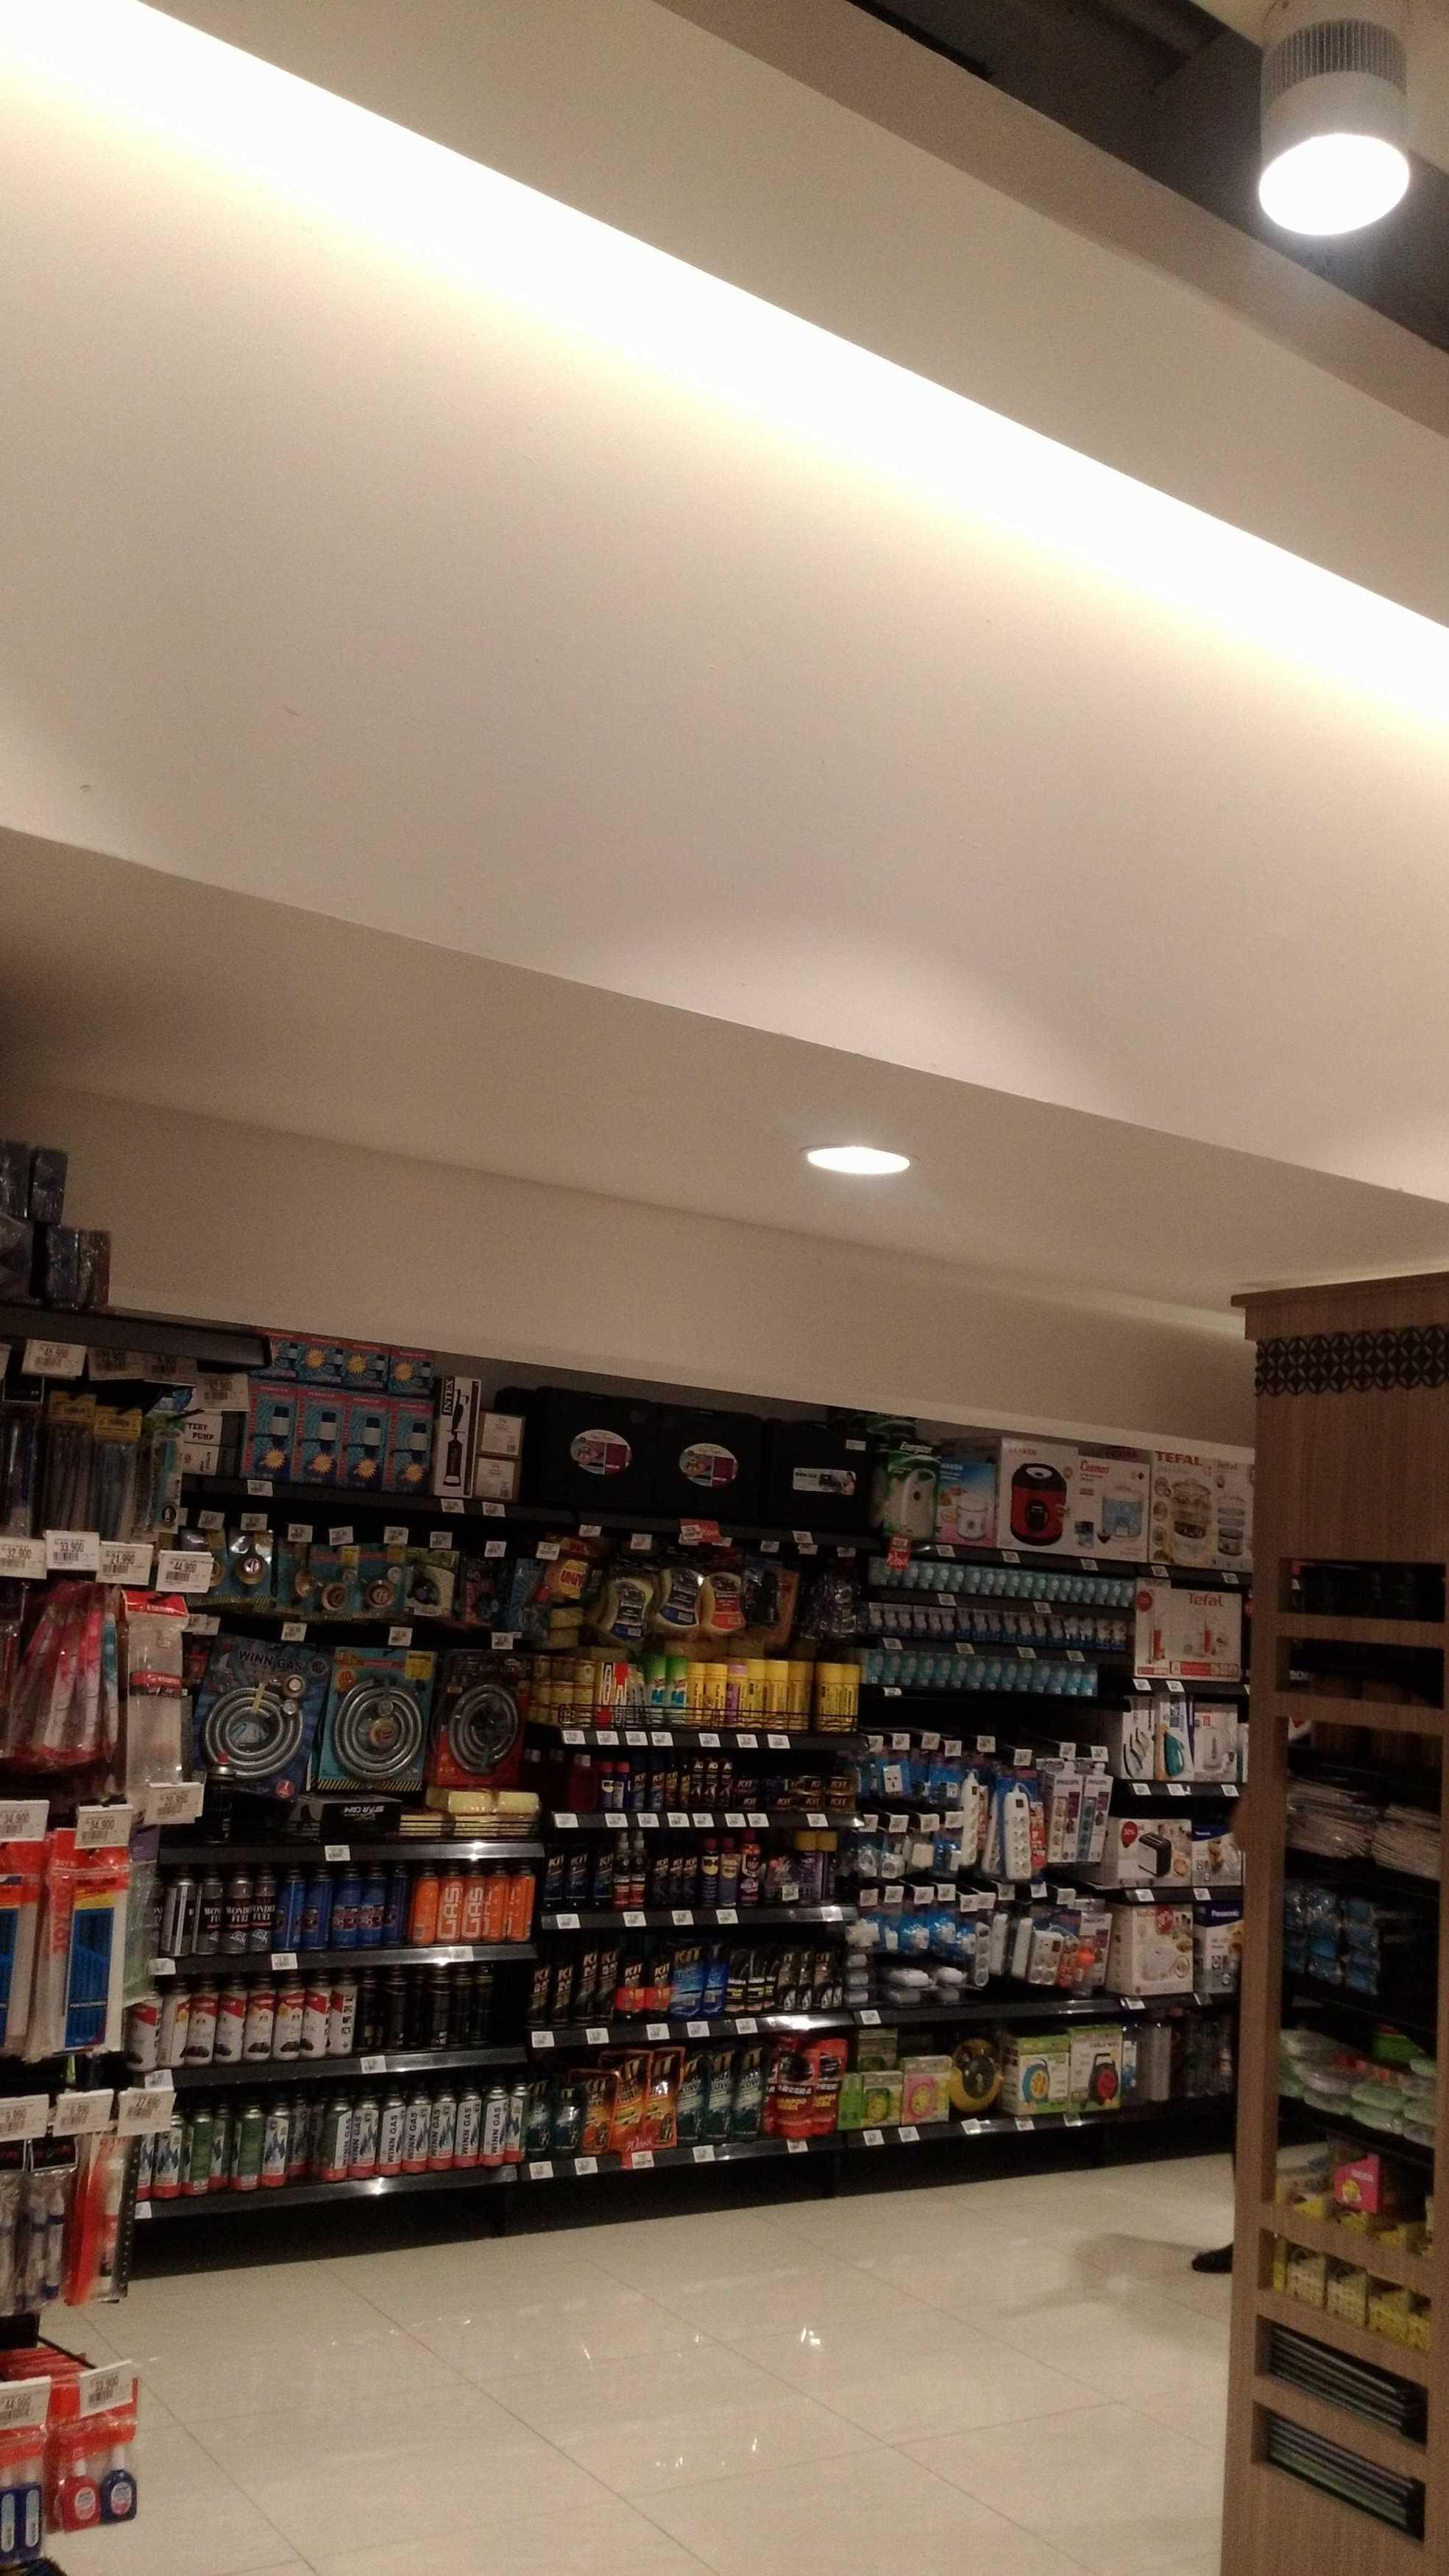 Aditio's Build And Design Hero Supermarket Jl. Metro Pondok Indah, Pd. Pinang, Kby. Lama, Kota Jakarta Selatan, Daerah Khusus Ibukota Jakarta 12310, Indonesia Jl. Metro Pondok Indah, Pd. Pinang, Kby. Lama, Kota Jakarta Selatan, Daerah Khusus Ibukota Jakarta 12310, Indonesia P20161207125946 Industrial  36523